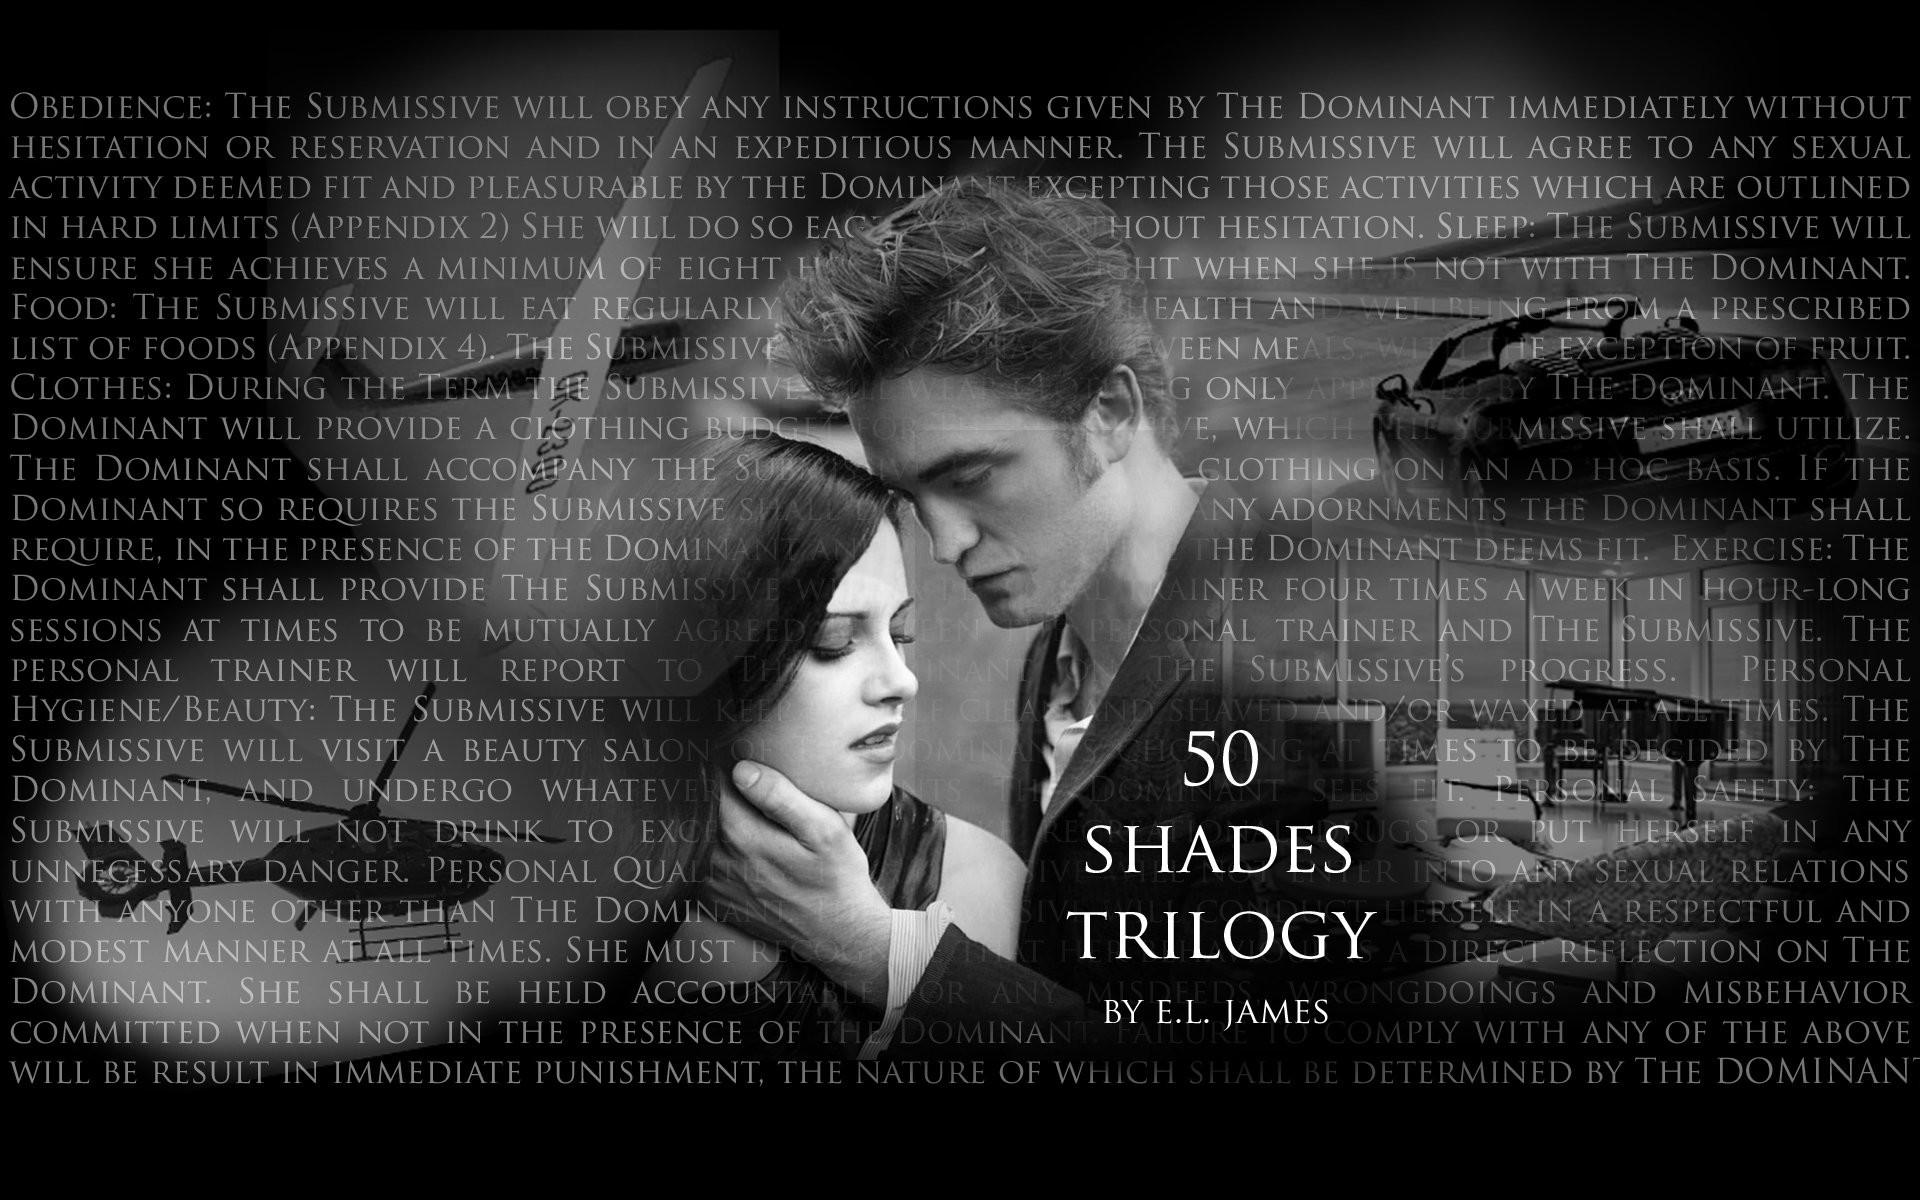 FIFTY SHADES OF GREY drama romance book wallpaper     521775    WallpaperUP